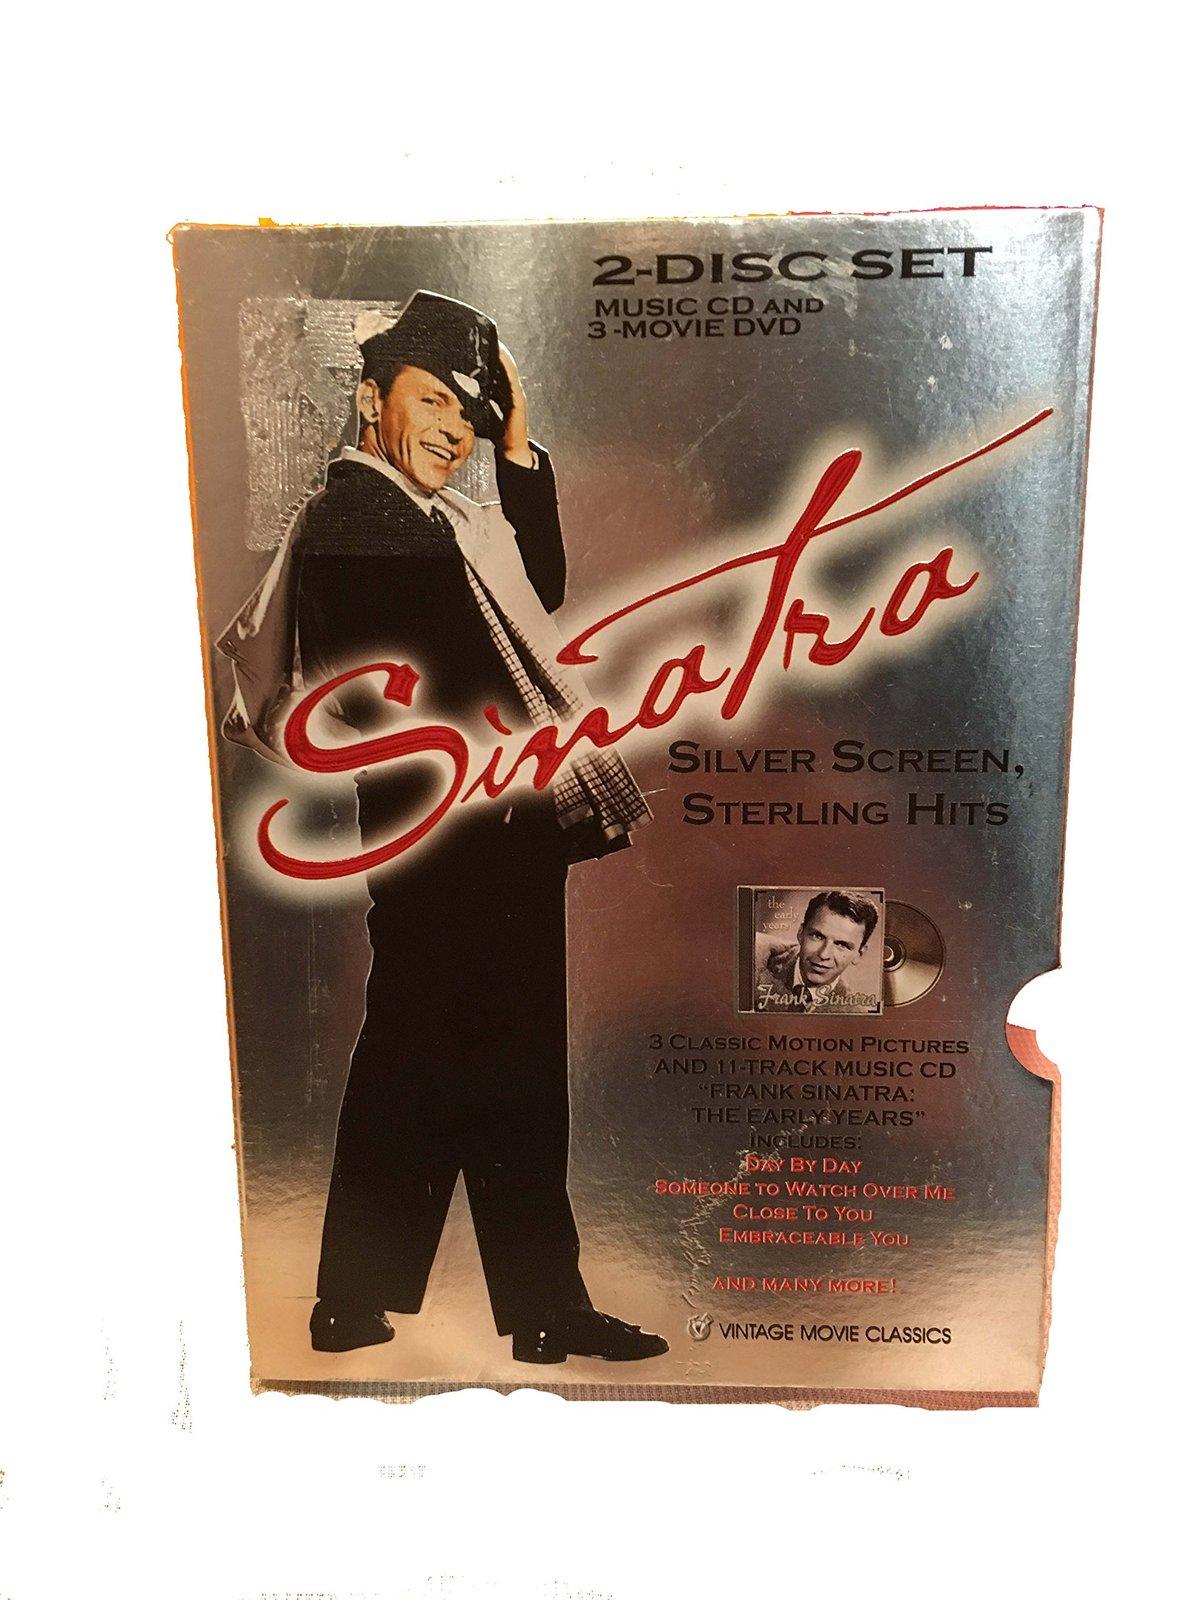 Frank Sinatra Music CD & DVD - 2 Disc Set image 2